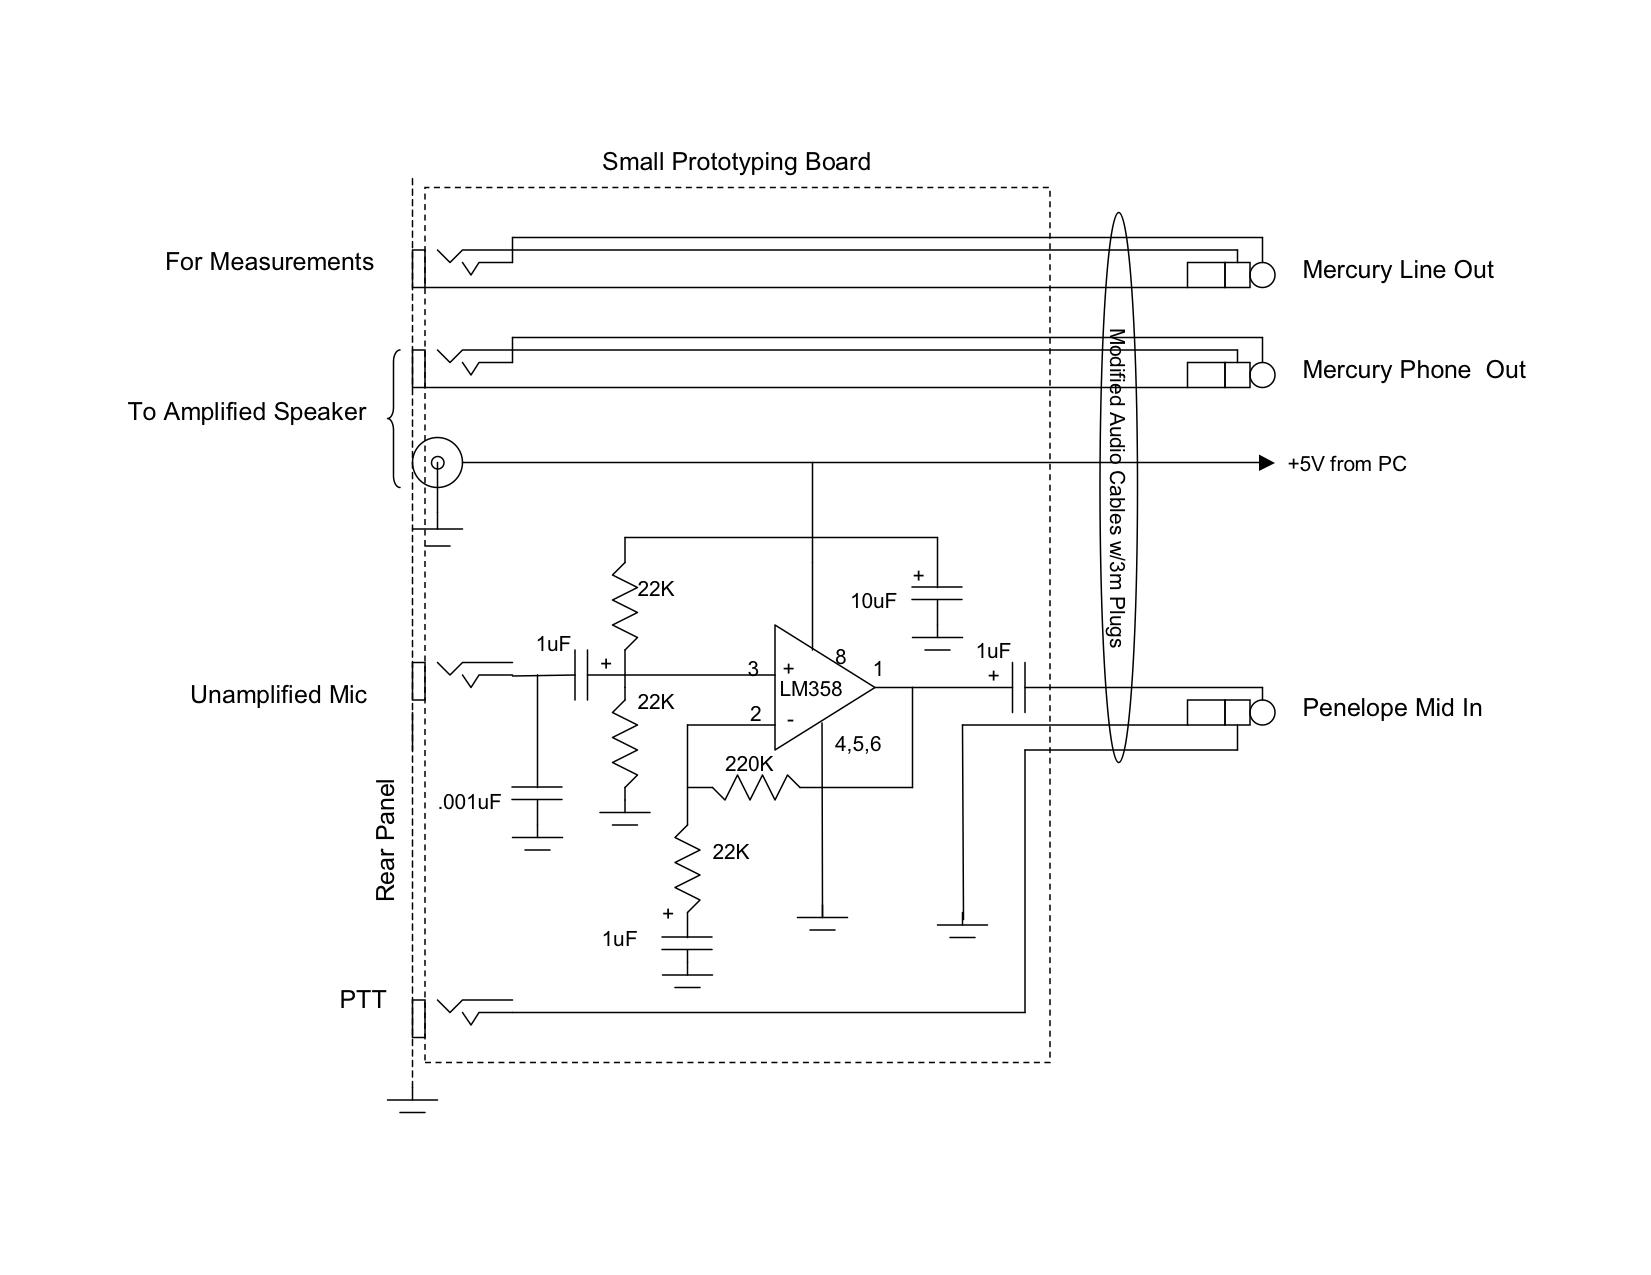 wiring diagram 1964 mercury comet 1968 ford mustang wiring